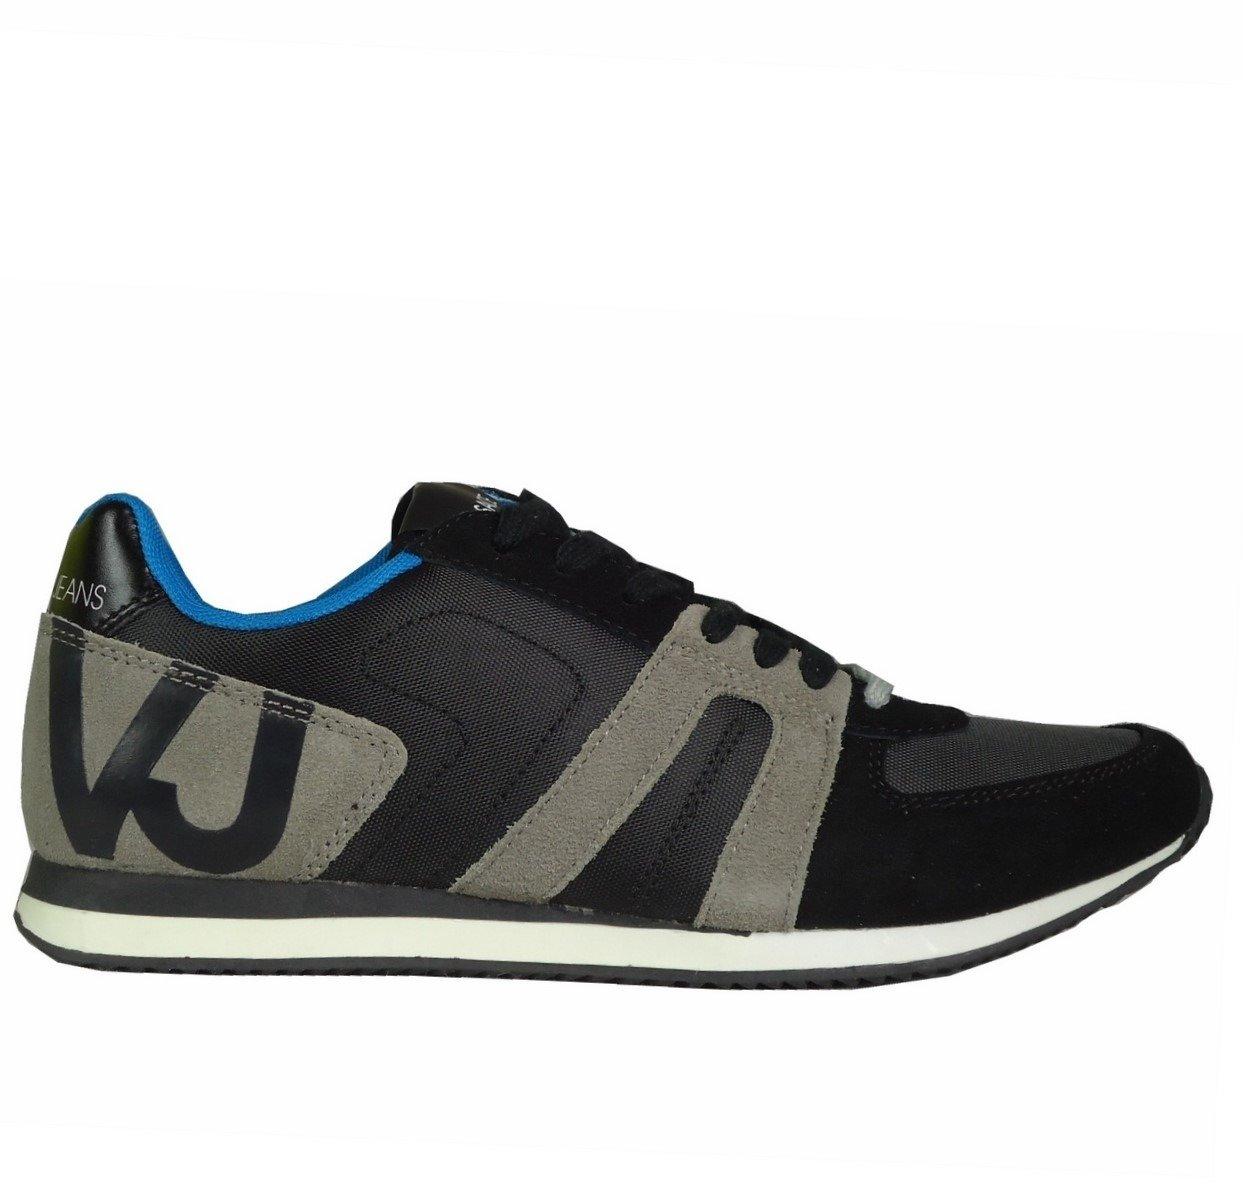 Sneaker Homme Men Schwarz Versace ChaussuresShoes Jeans wOknP0